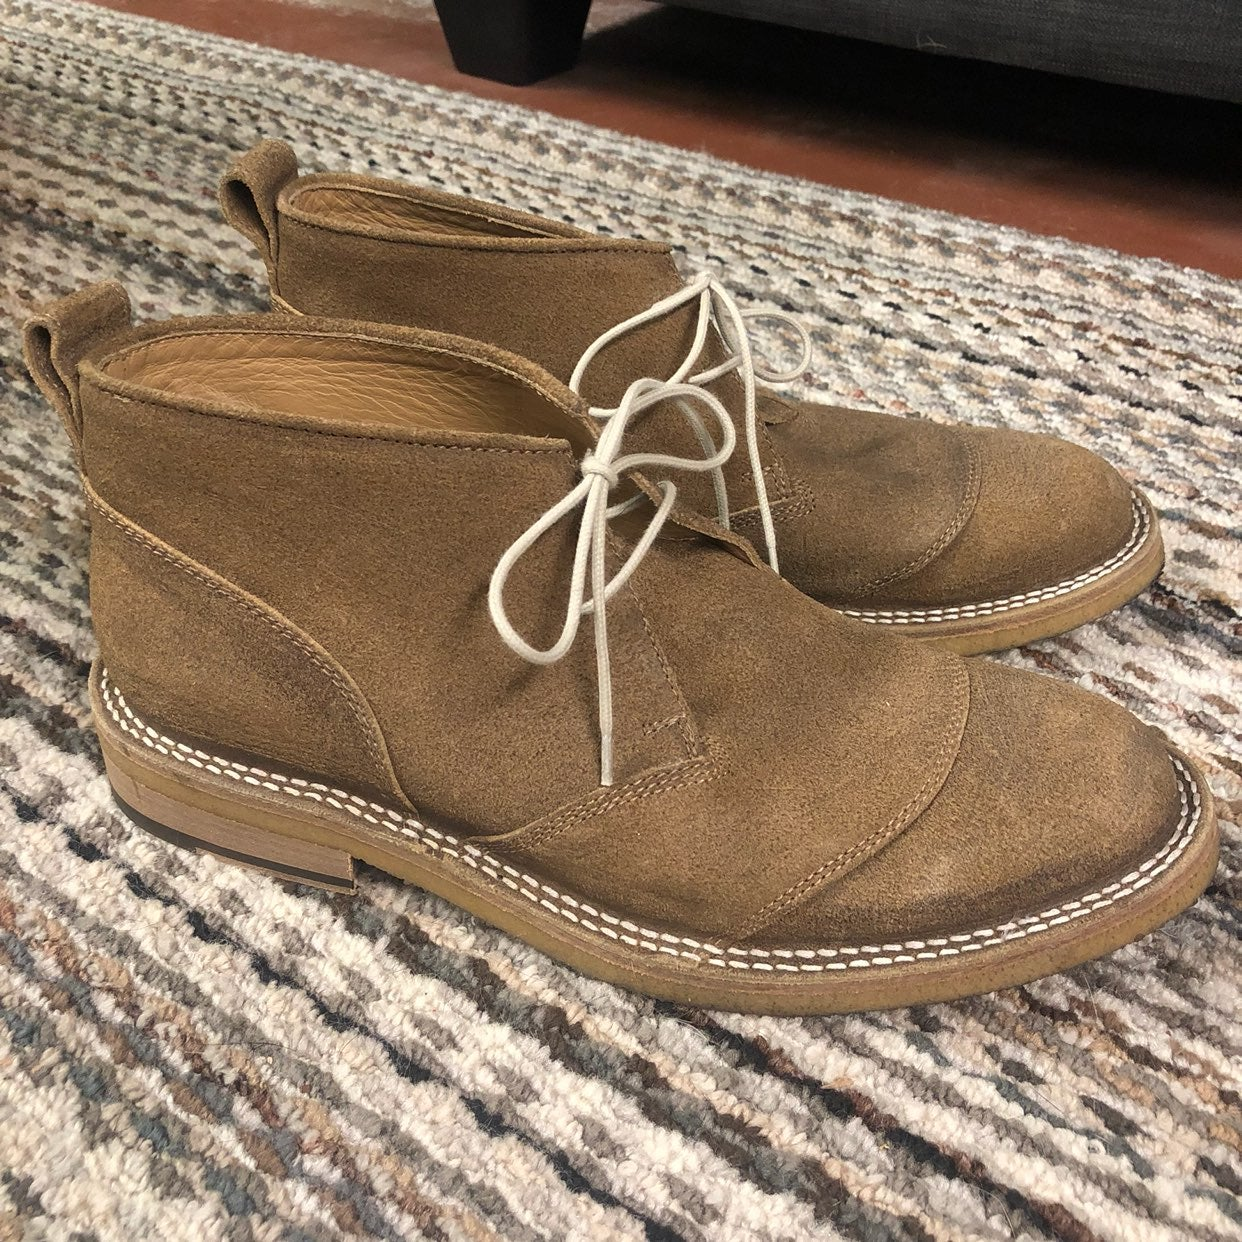 Belstaff England Suede Chukka Boots